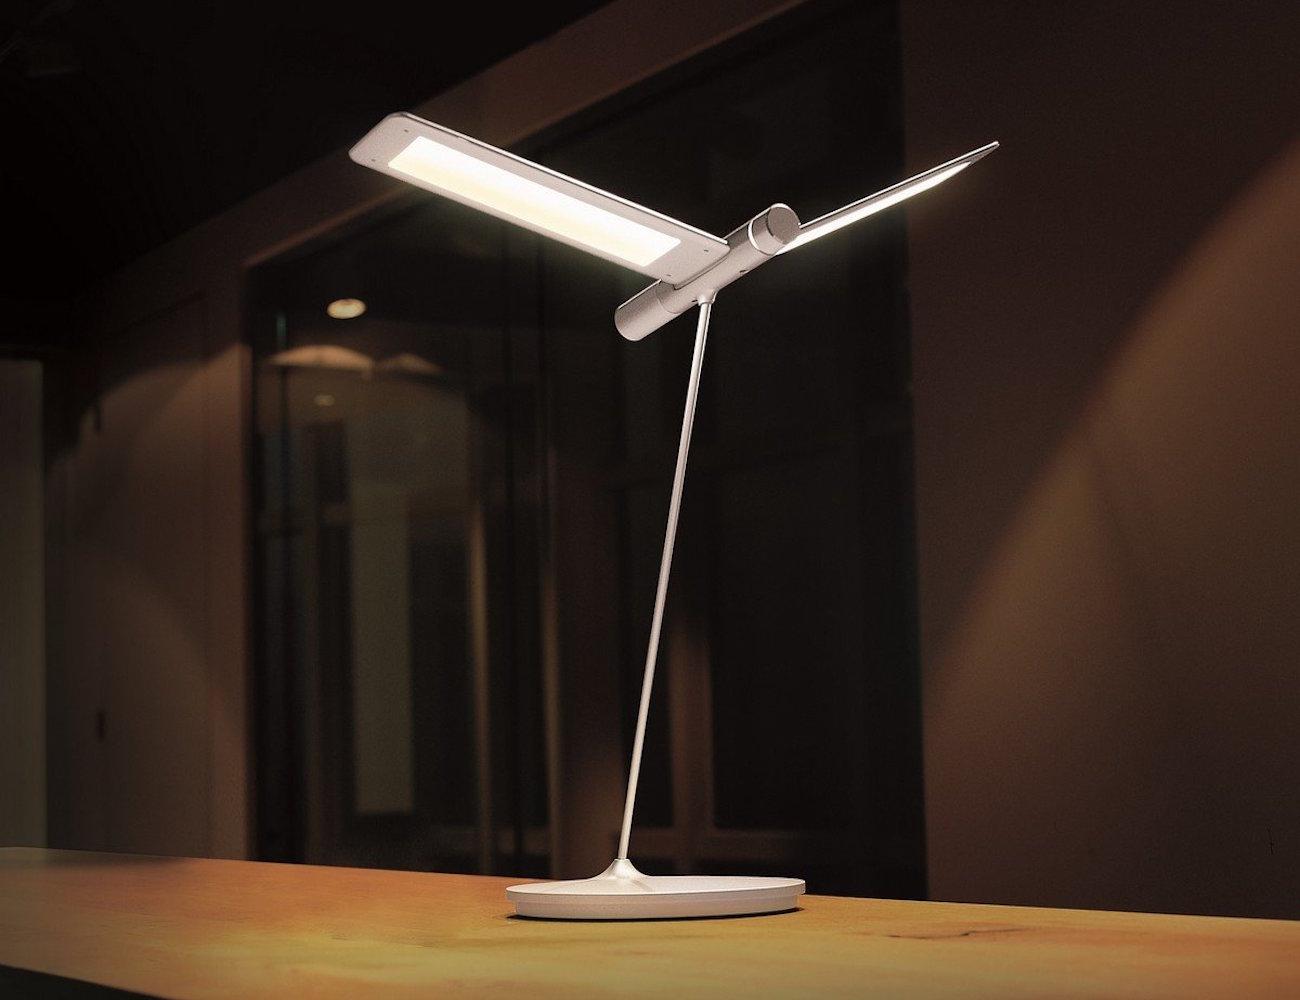 Seagull LED Desk Lamp by QisDesign  Gadget Flow